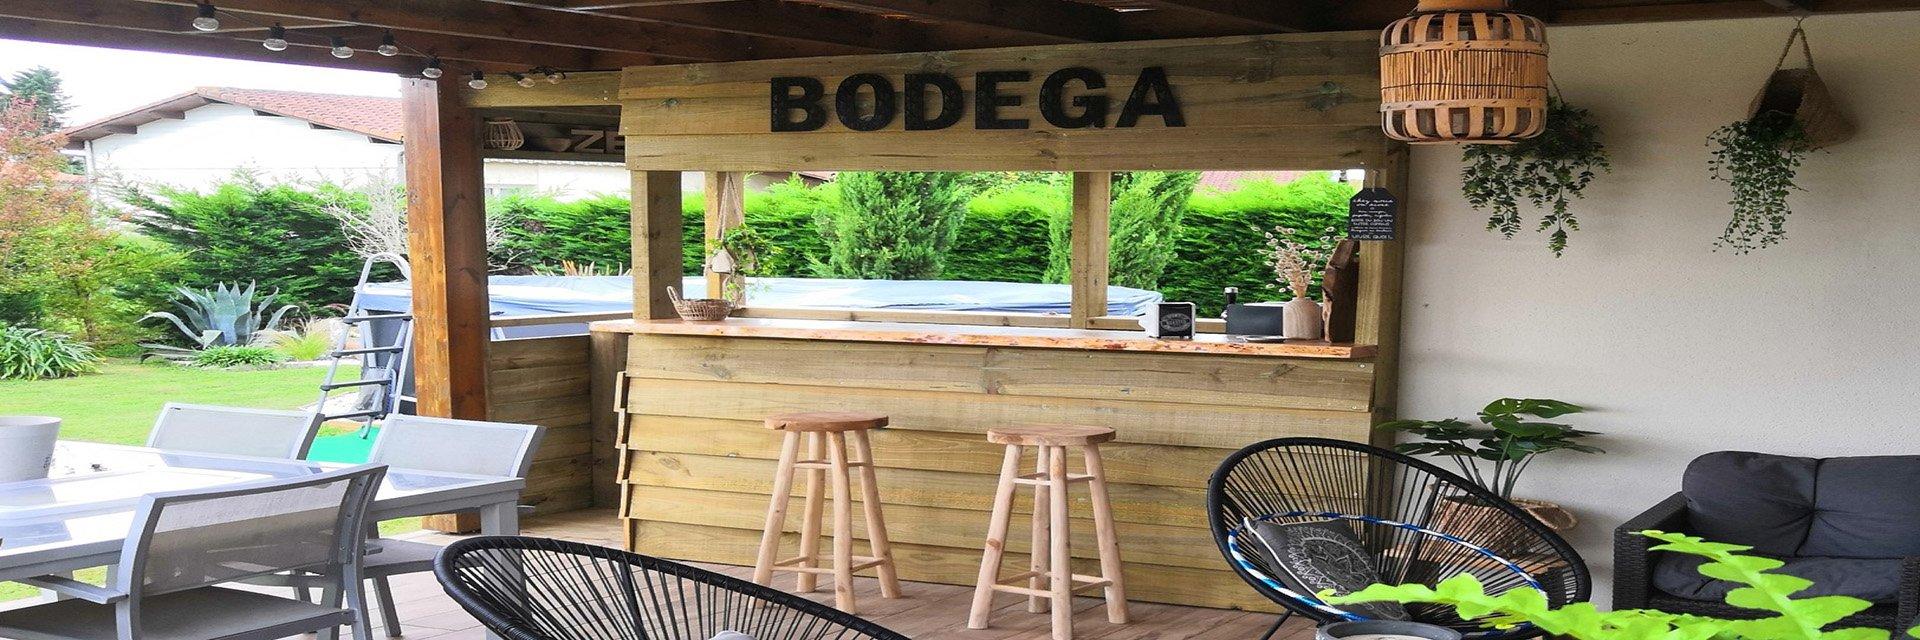 idea bois nicolas terrasse bois cl ture jardin et. Black Bedroom Furniture Sets. Home Design Ideas